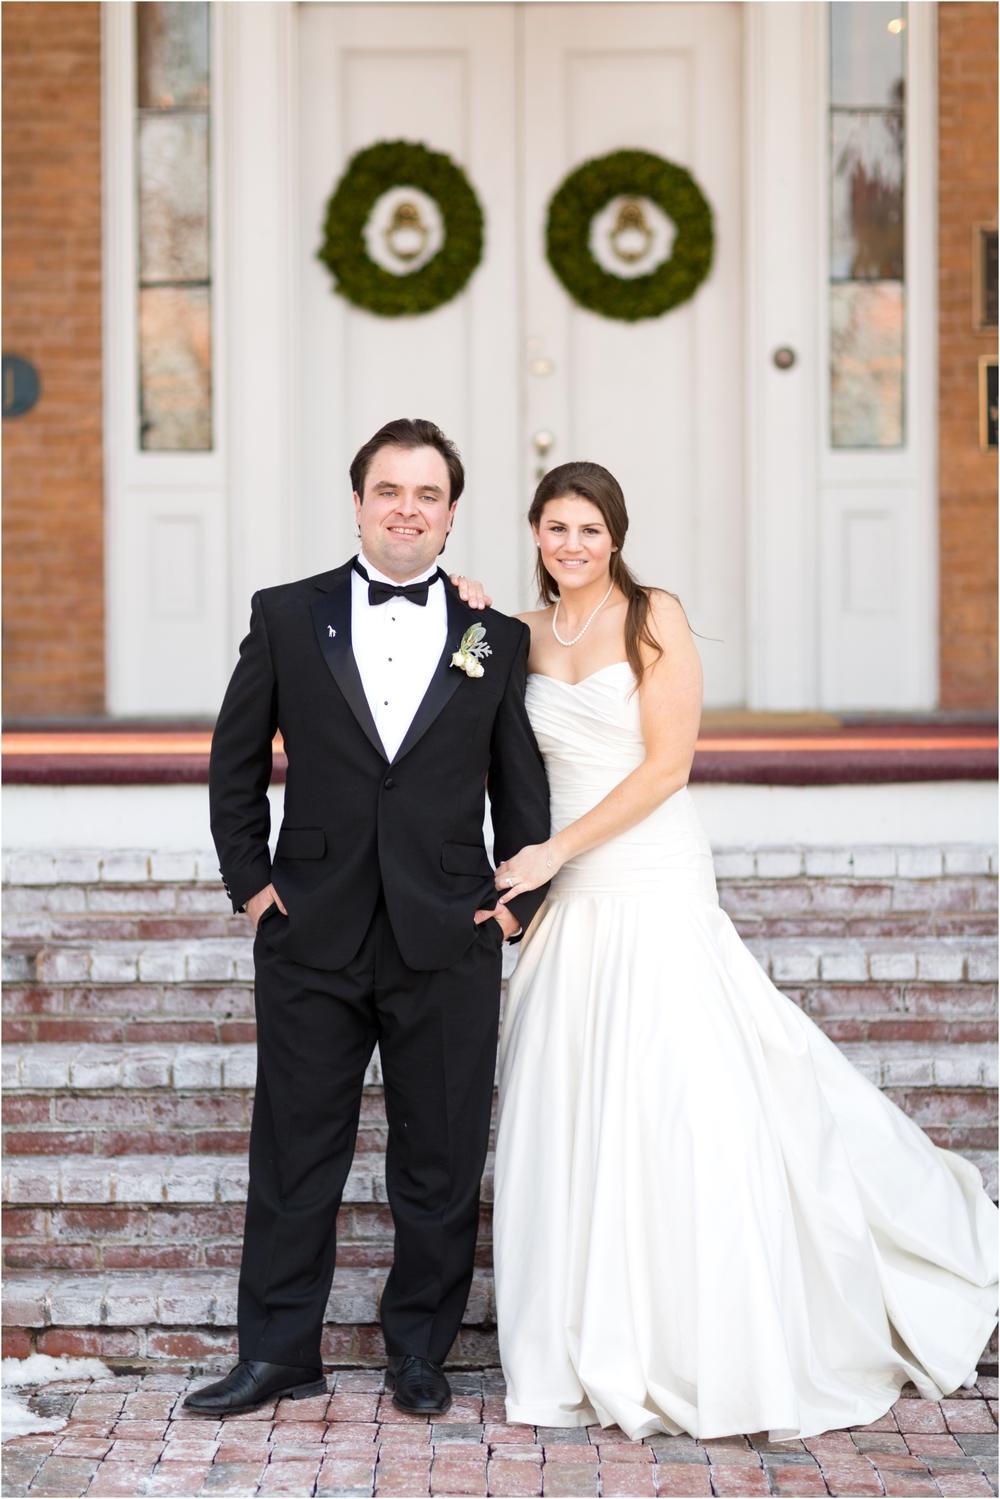 2-Dunn-Wedding-Bride-Groom-Portraits-1226.jpg